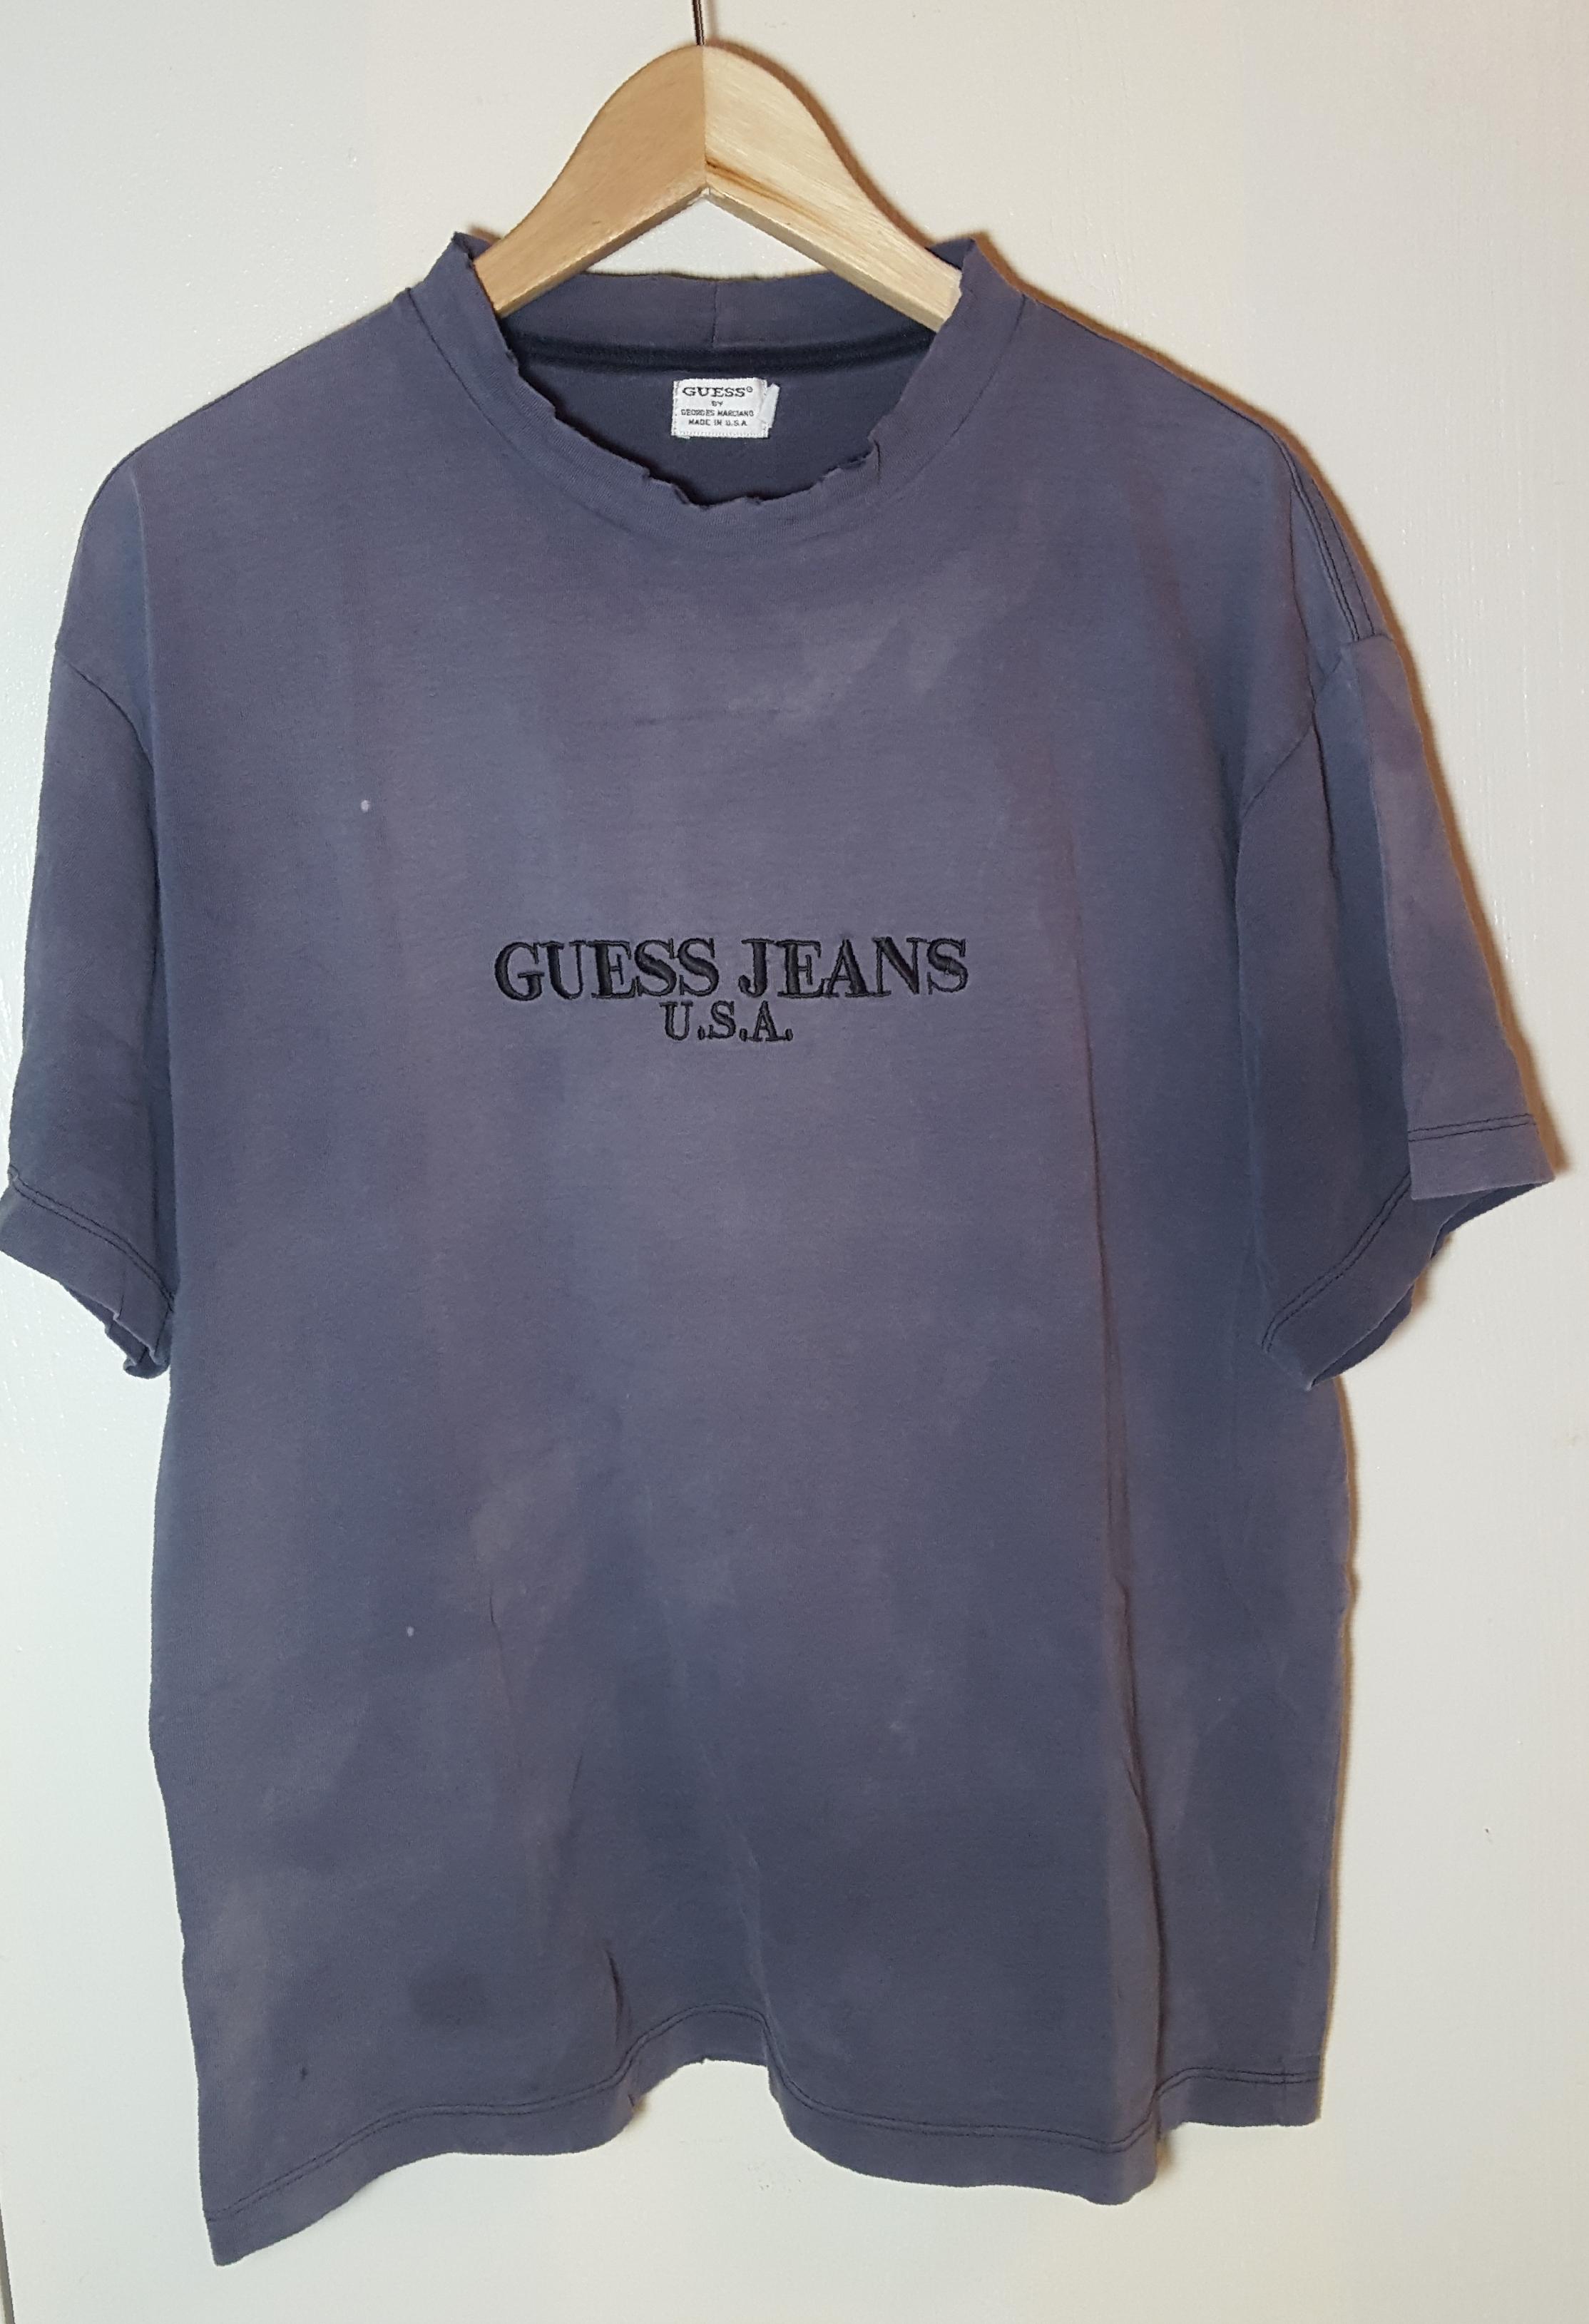 5e4e4c51a43f Vintage Vintage Guess Jeans Overdyed Black Embroidered T Shirt Men Sz M |  Grailed